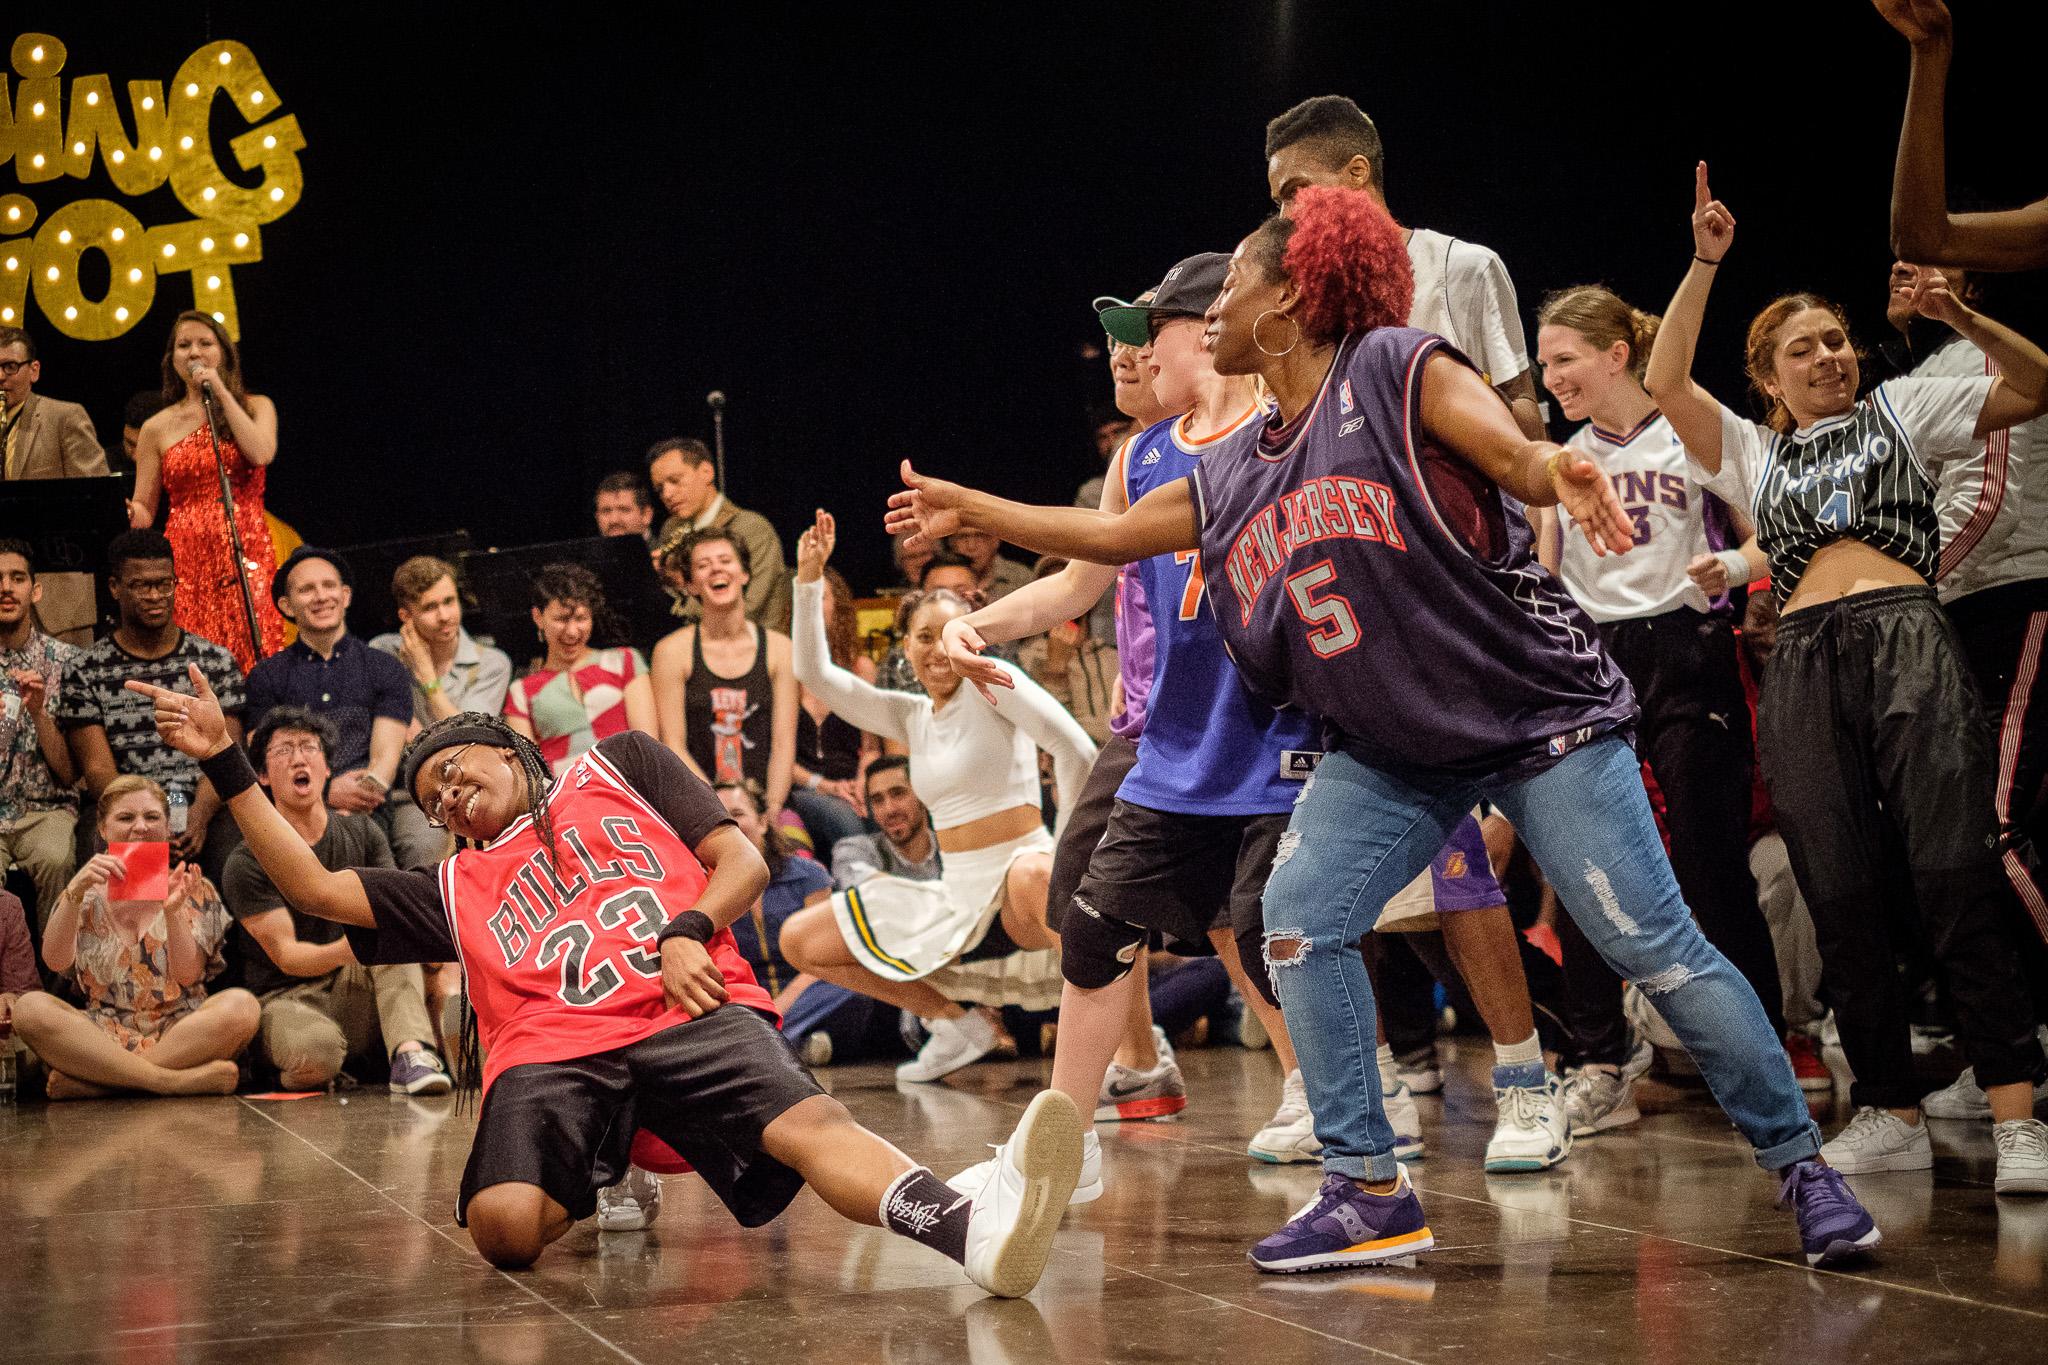 dance-montreal-swing-riot-2011697.jpg